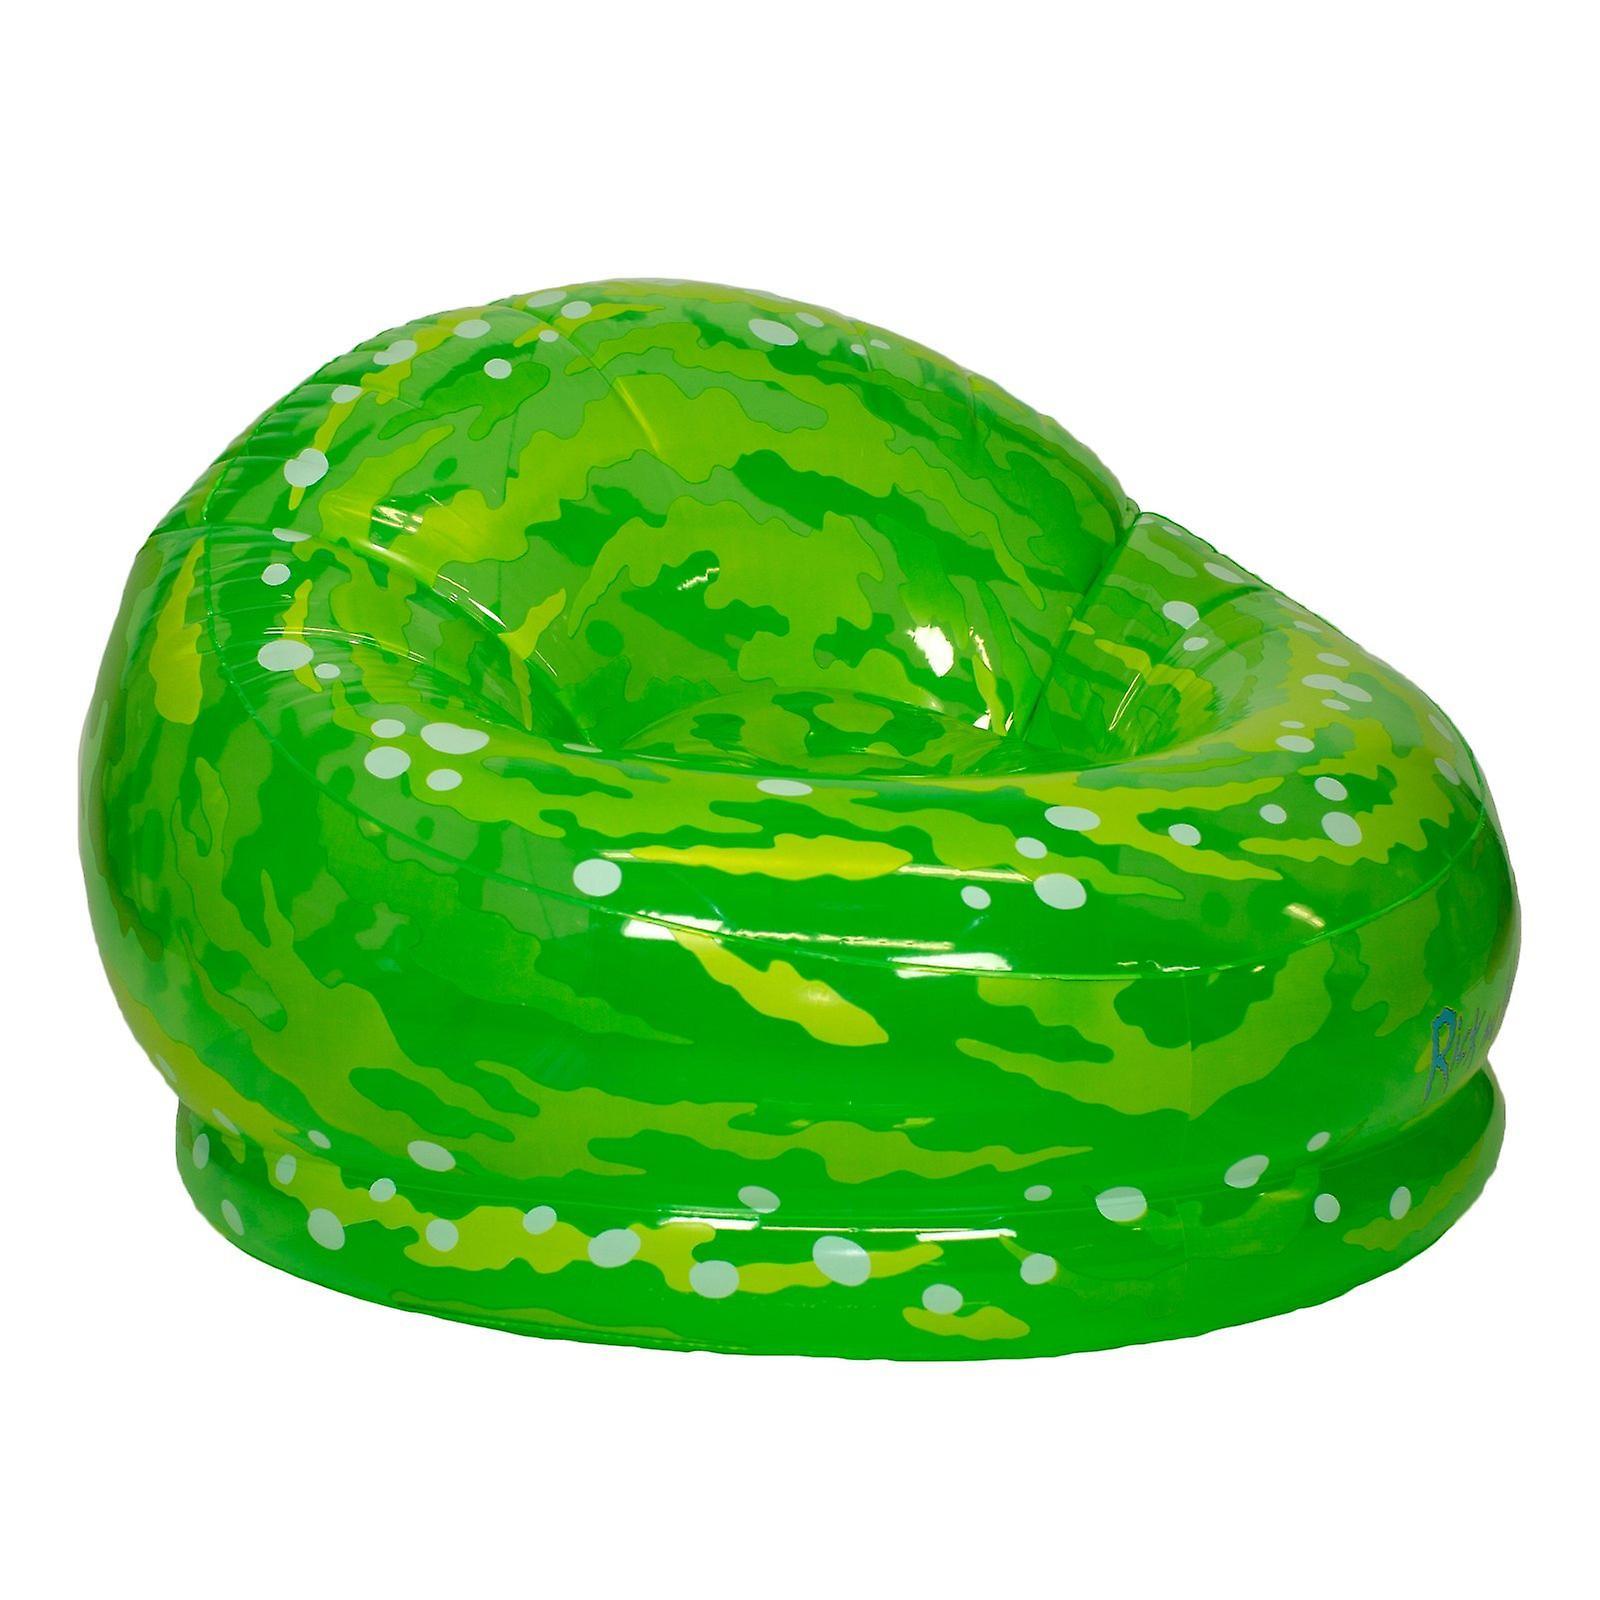 Rick & morty - illuminating portal inflatable chair